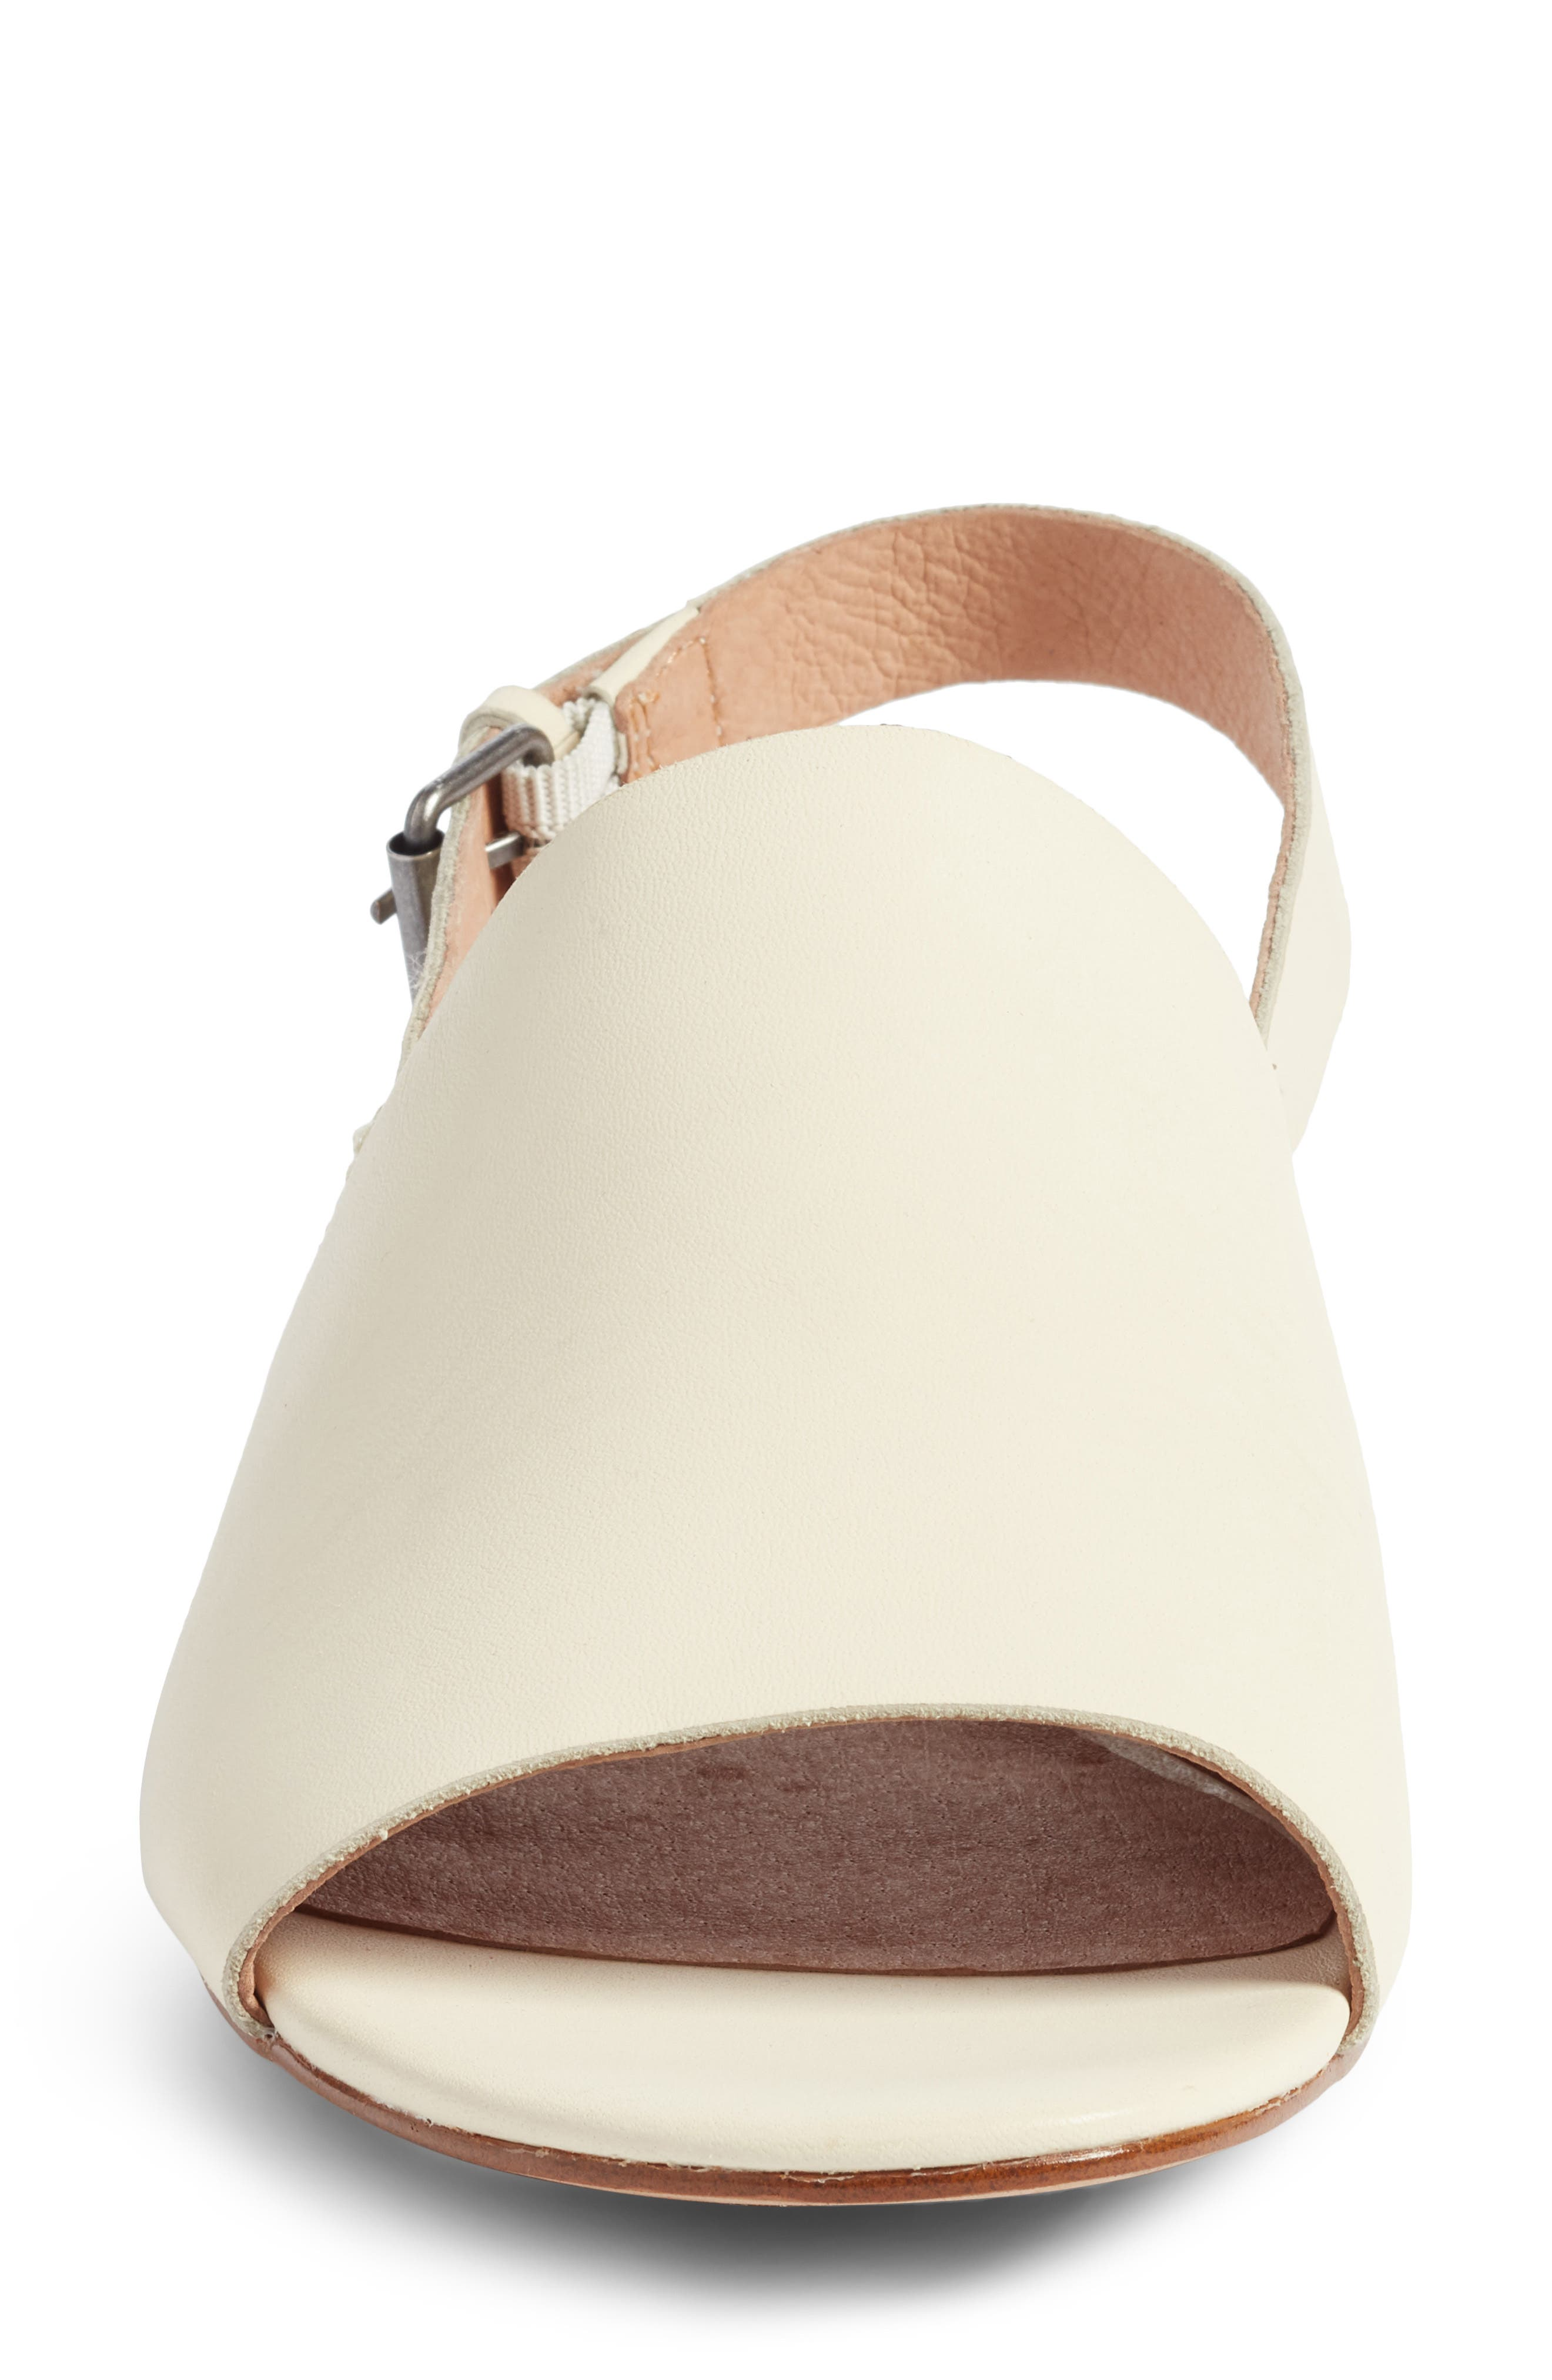 Noelle Slingback Sandal,                             Alternate thumbnail 4, color,                             Vintage Canvas Leather